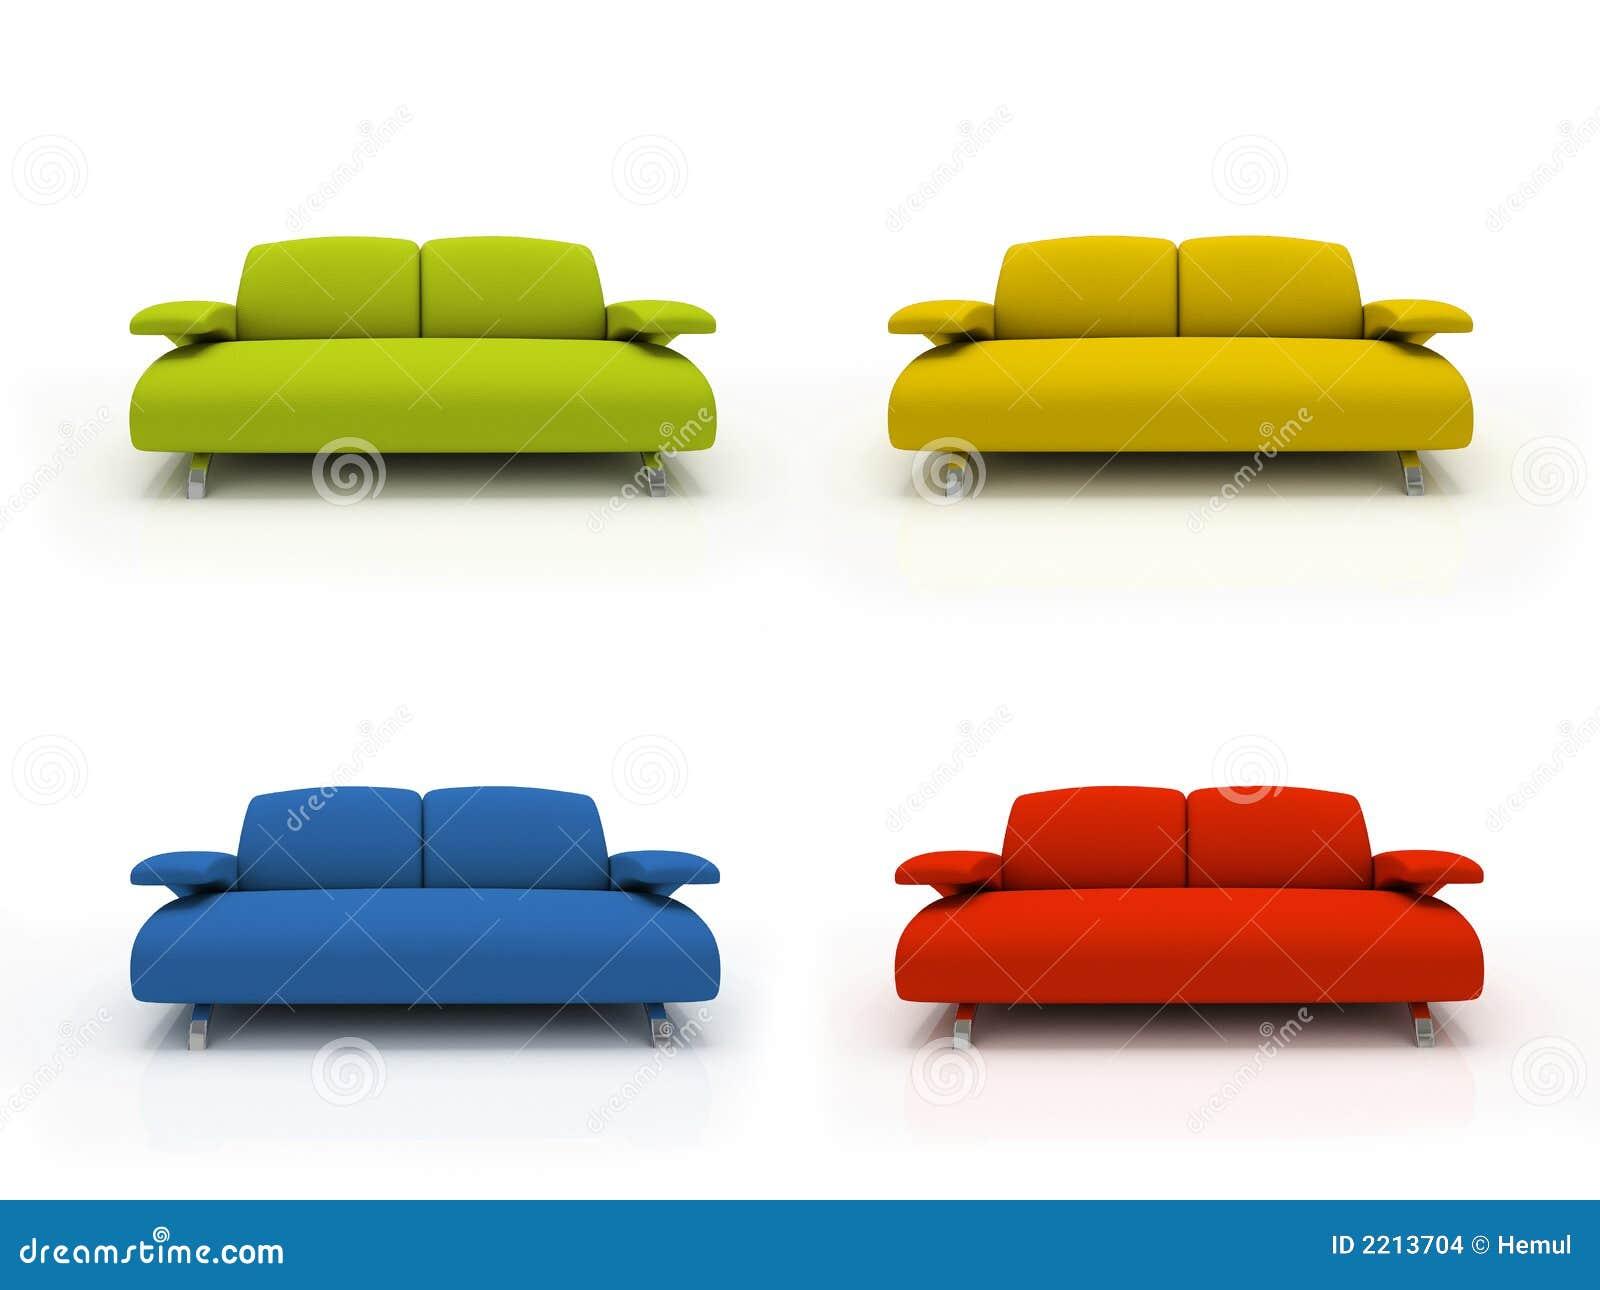 Colorful Modern Sofa